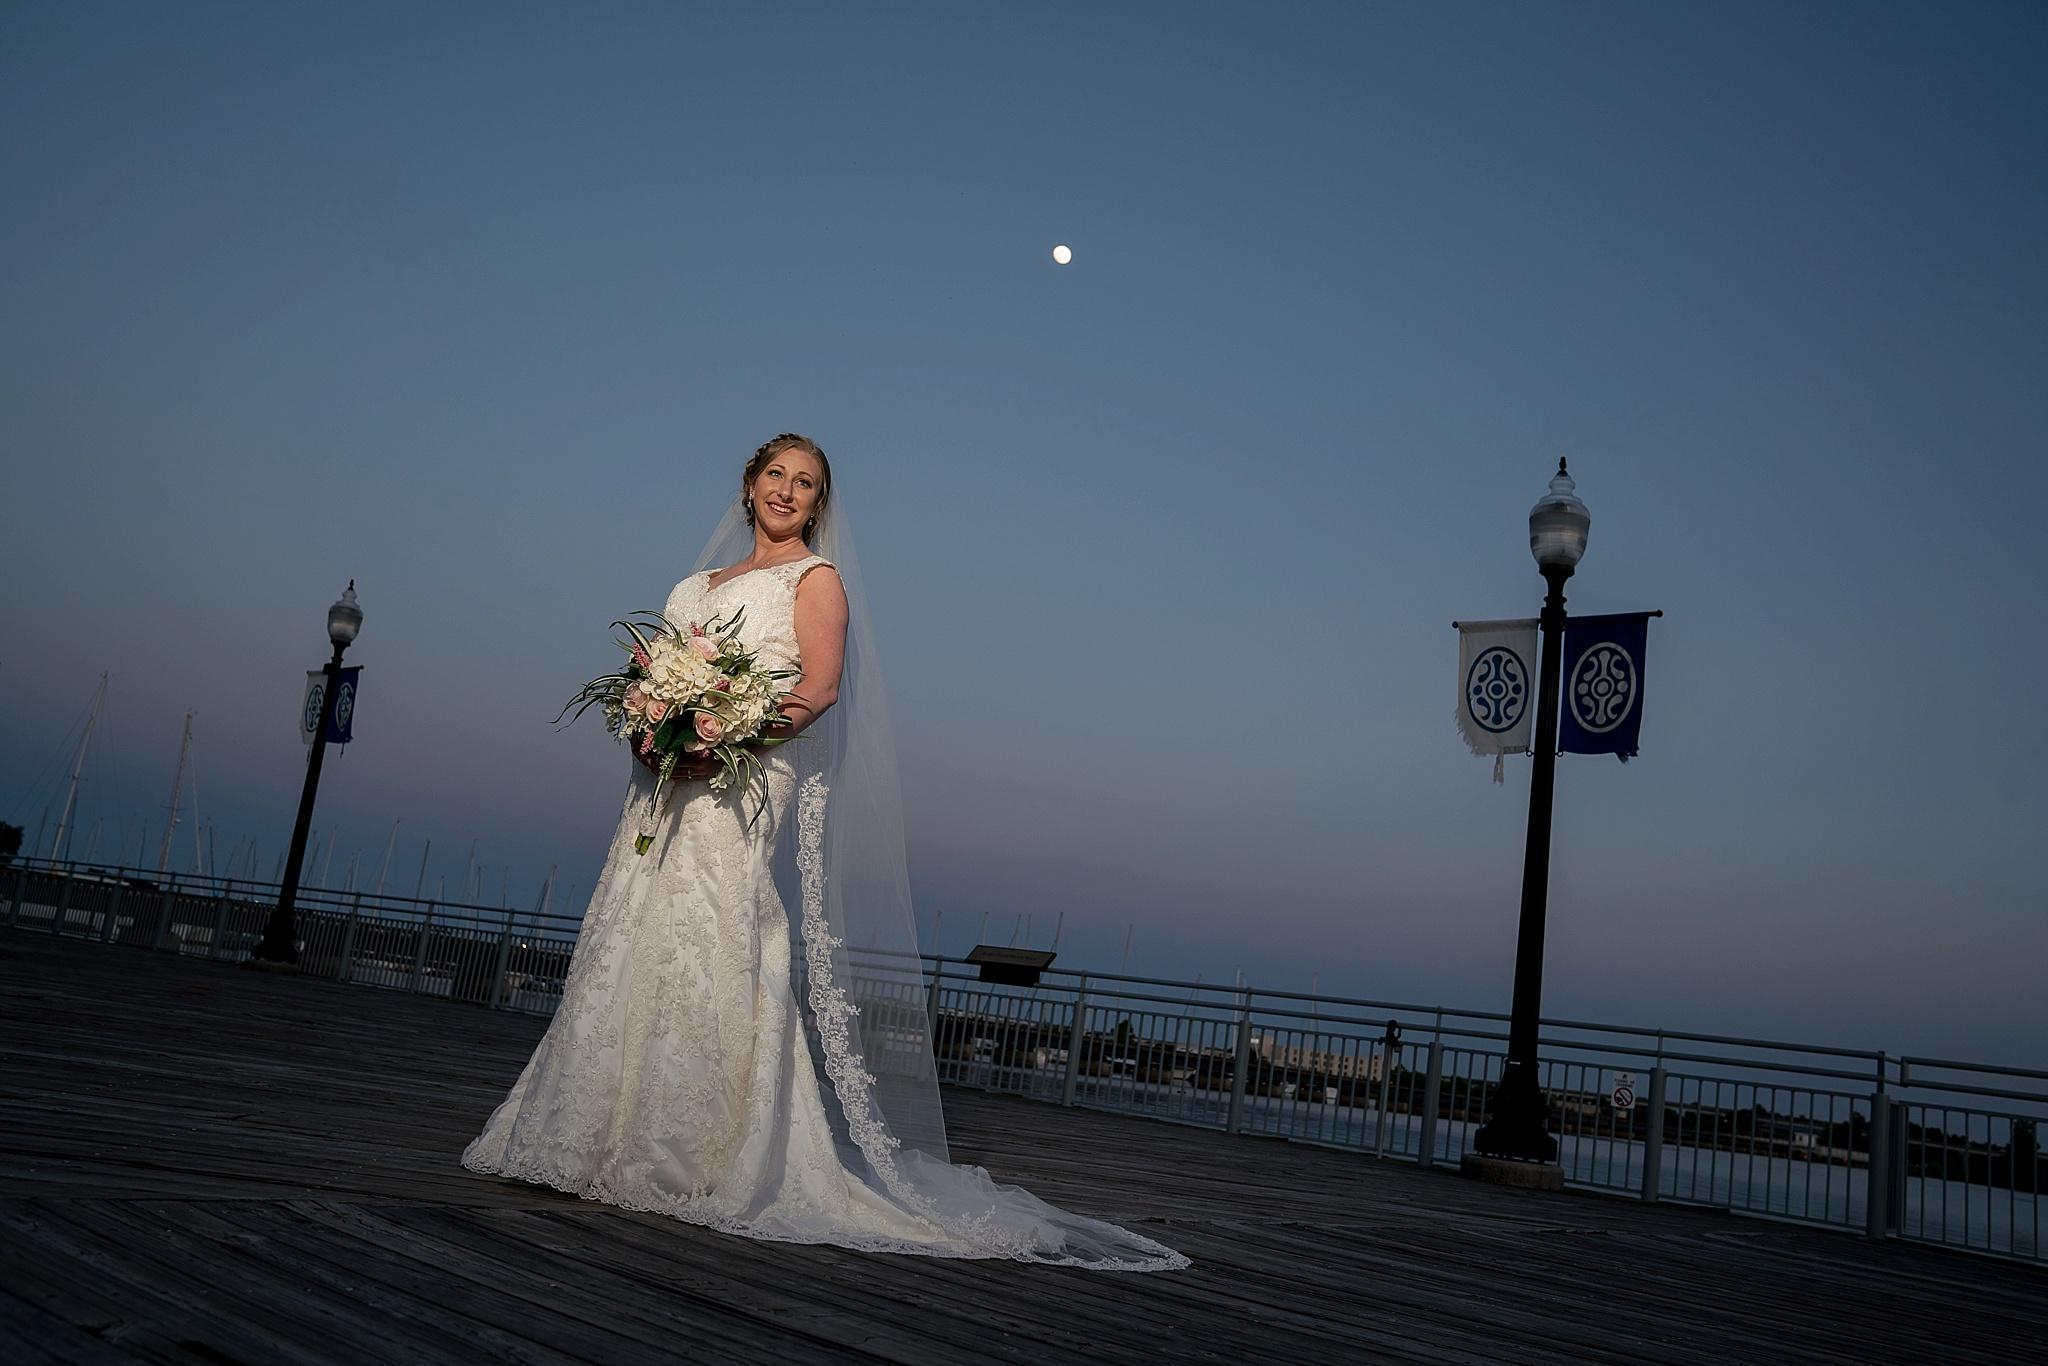 New-Bern-NC-Wedding-Photographer-078.jpg